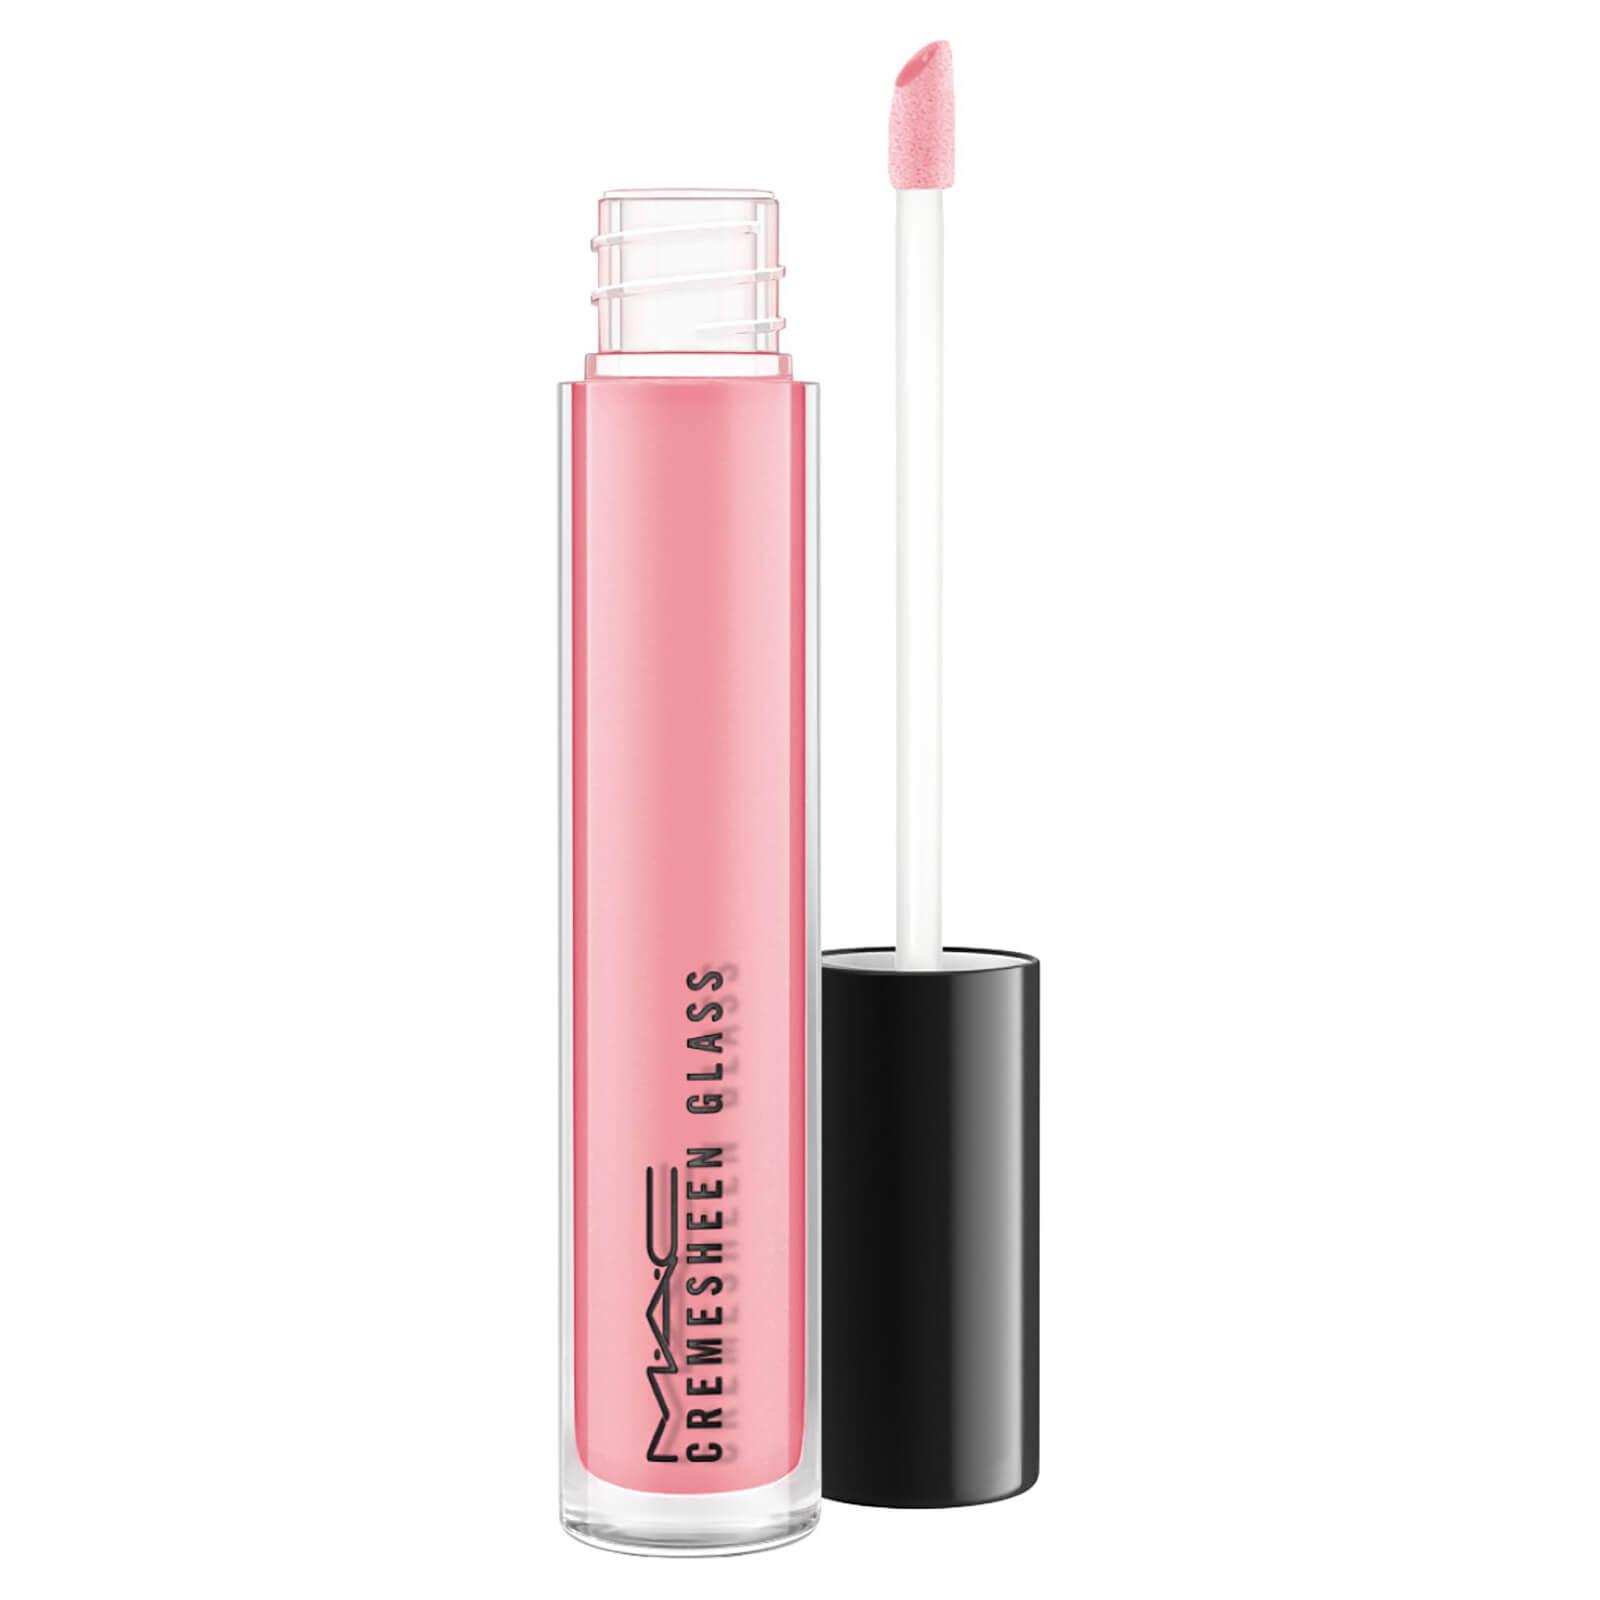 MAC Brillant à Lèvres Cremesheen Glass Lip Finish (teintes variées) - Partial To Pink